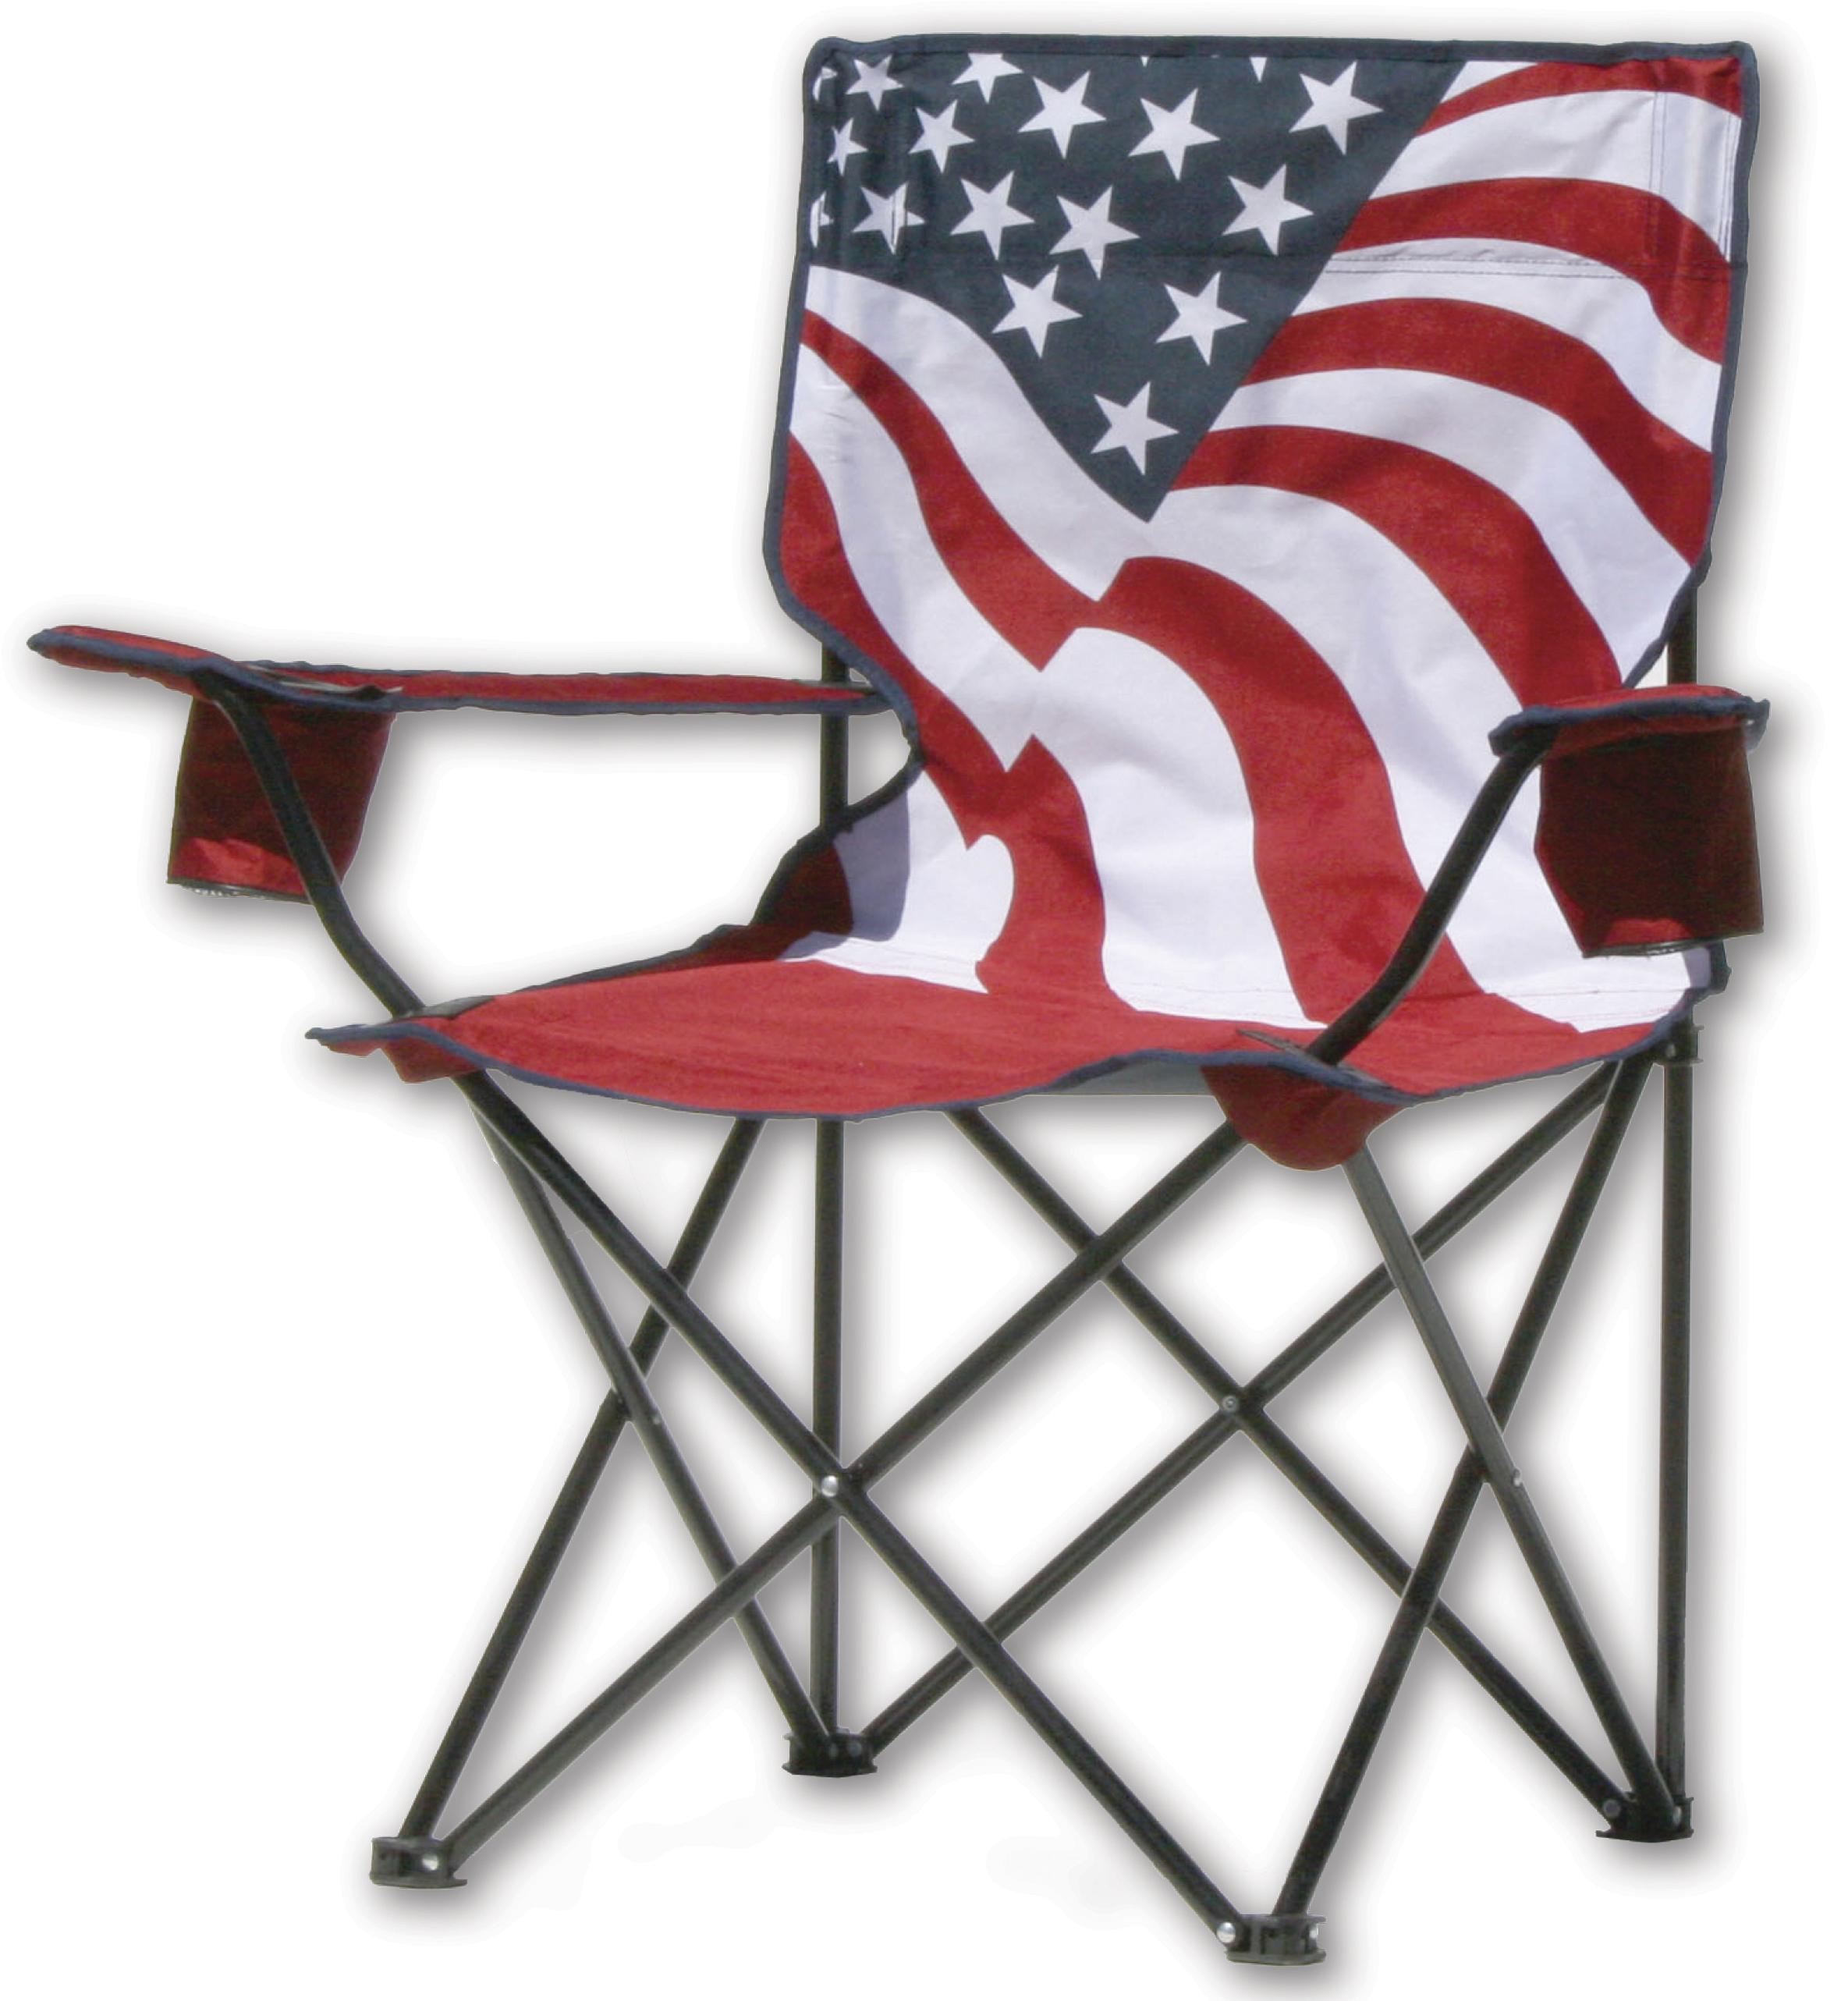 folding quad chair salon dryer chairs quik american flag pattern